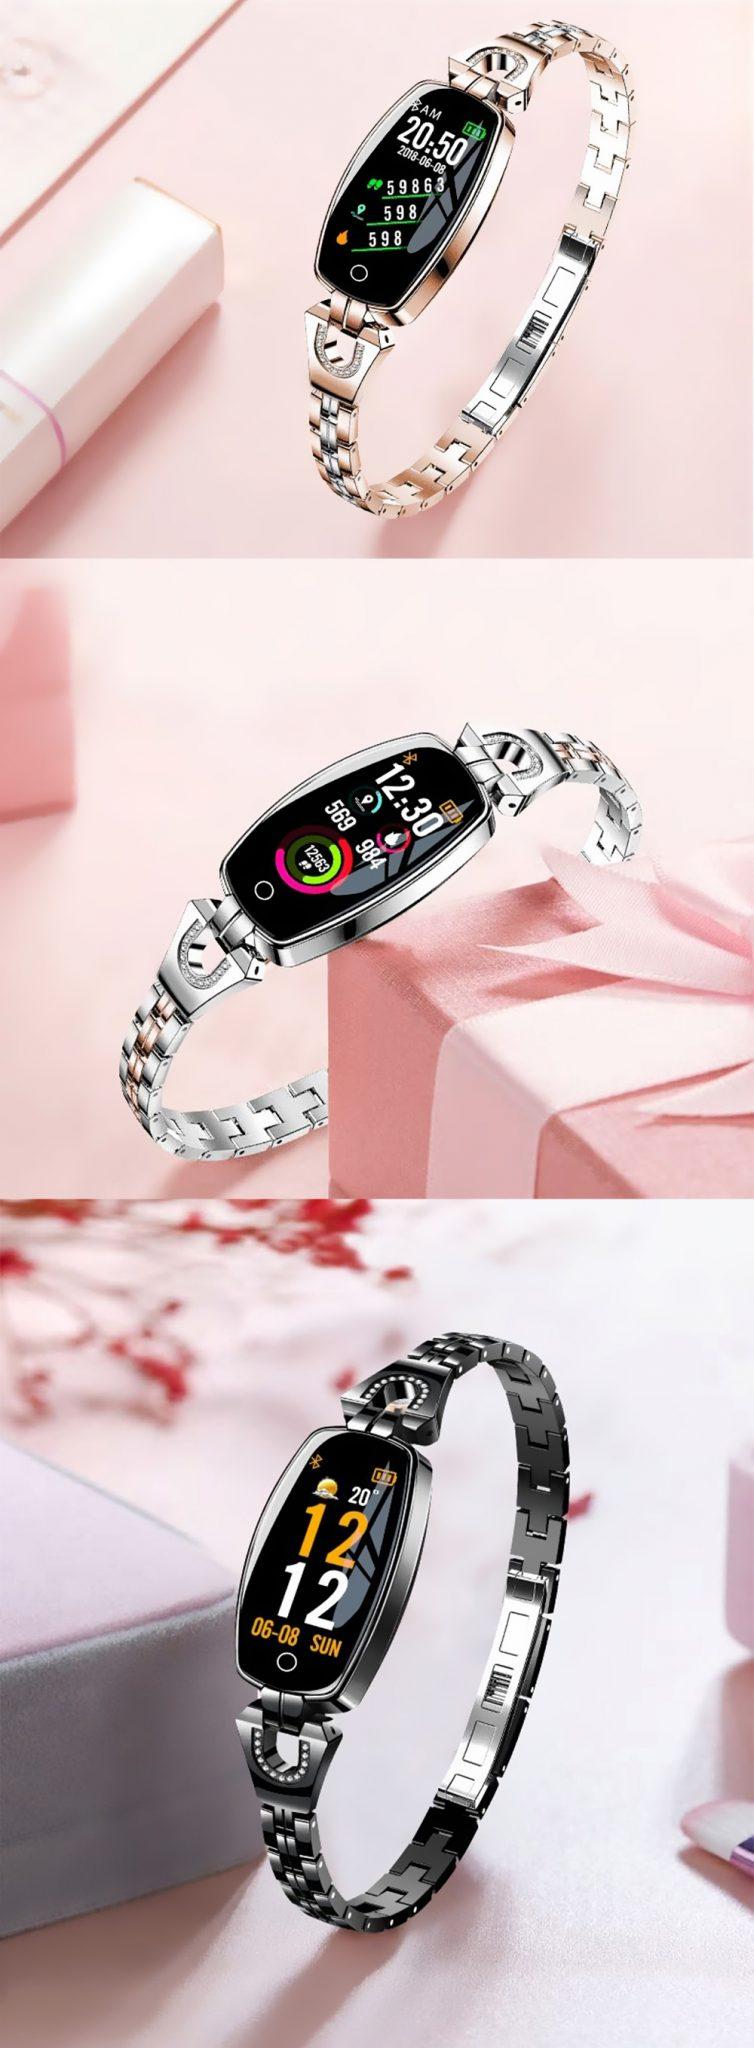 Bratara fitness fashion H8 cu functie de monitorizare tensiune arteriala si ritm cardiac, Notificari, Pedometru, Bluetooth, Metal, Argintie